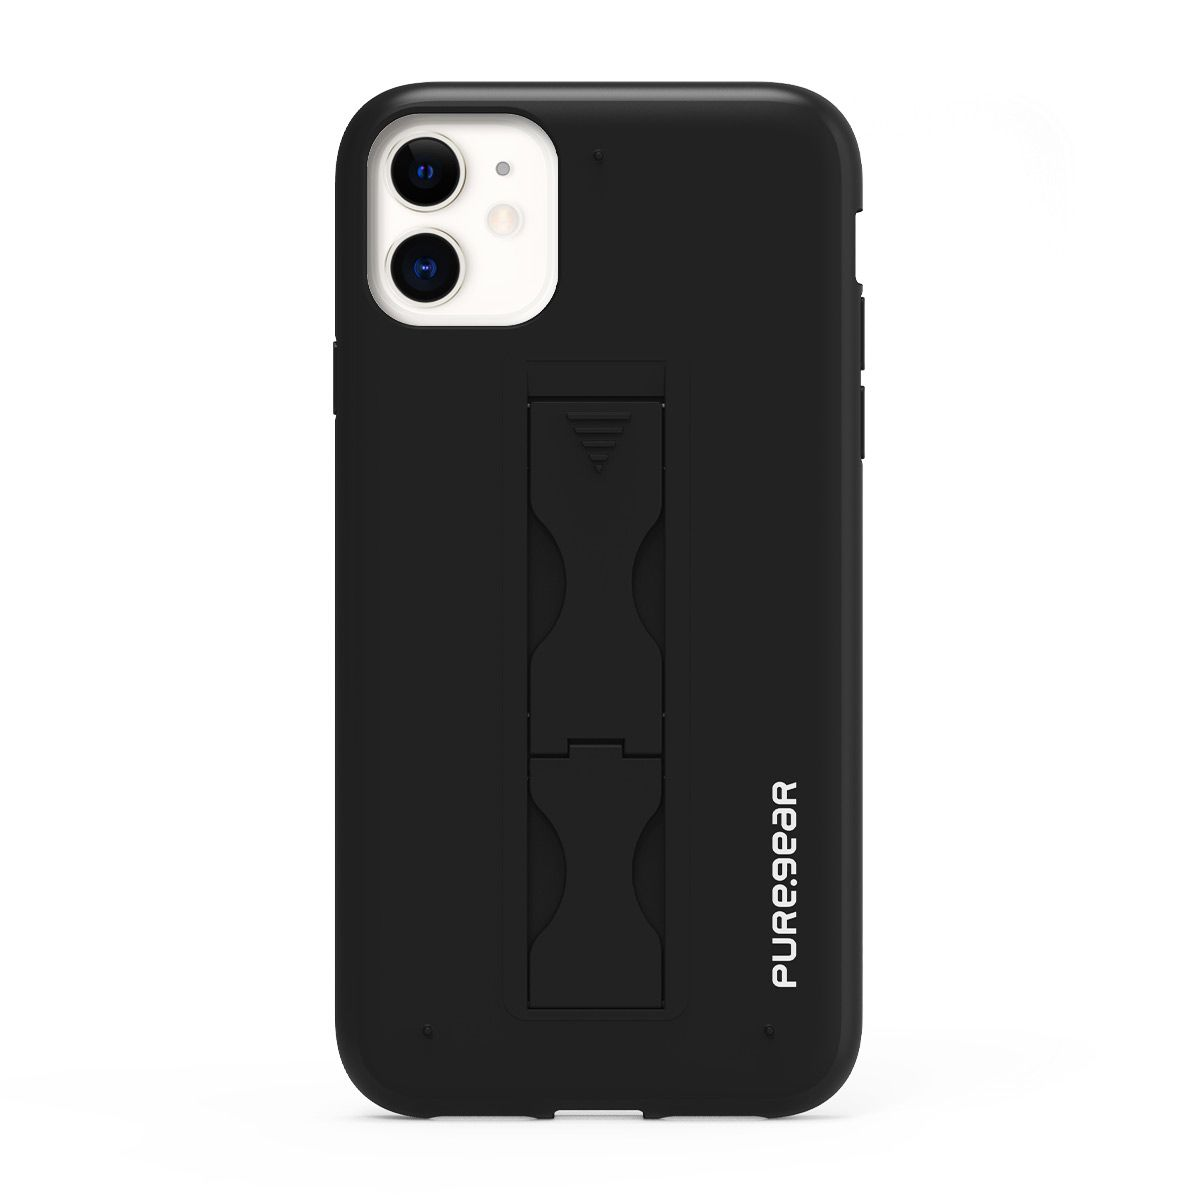 Apple iPhone 11 SlimStik, Antimicrobial Kickstand Case – Nightfall